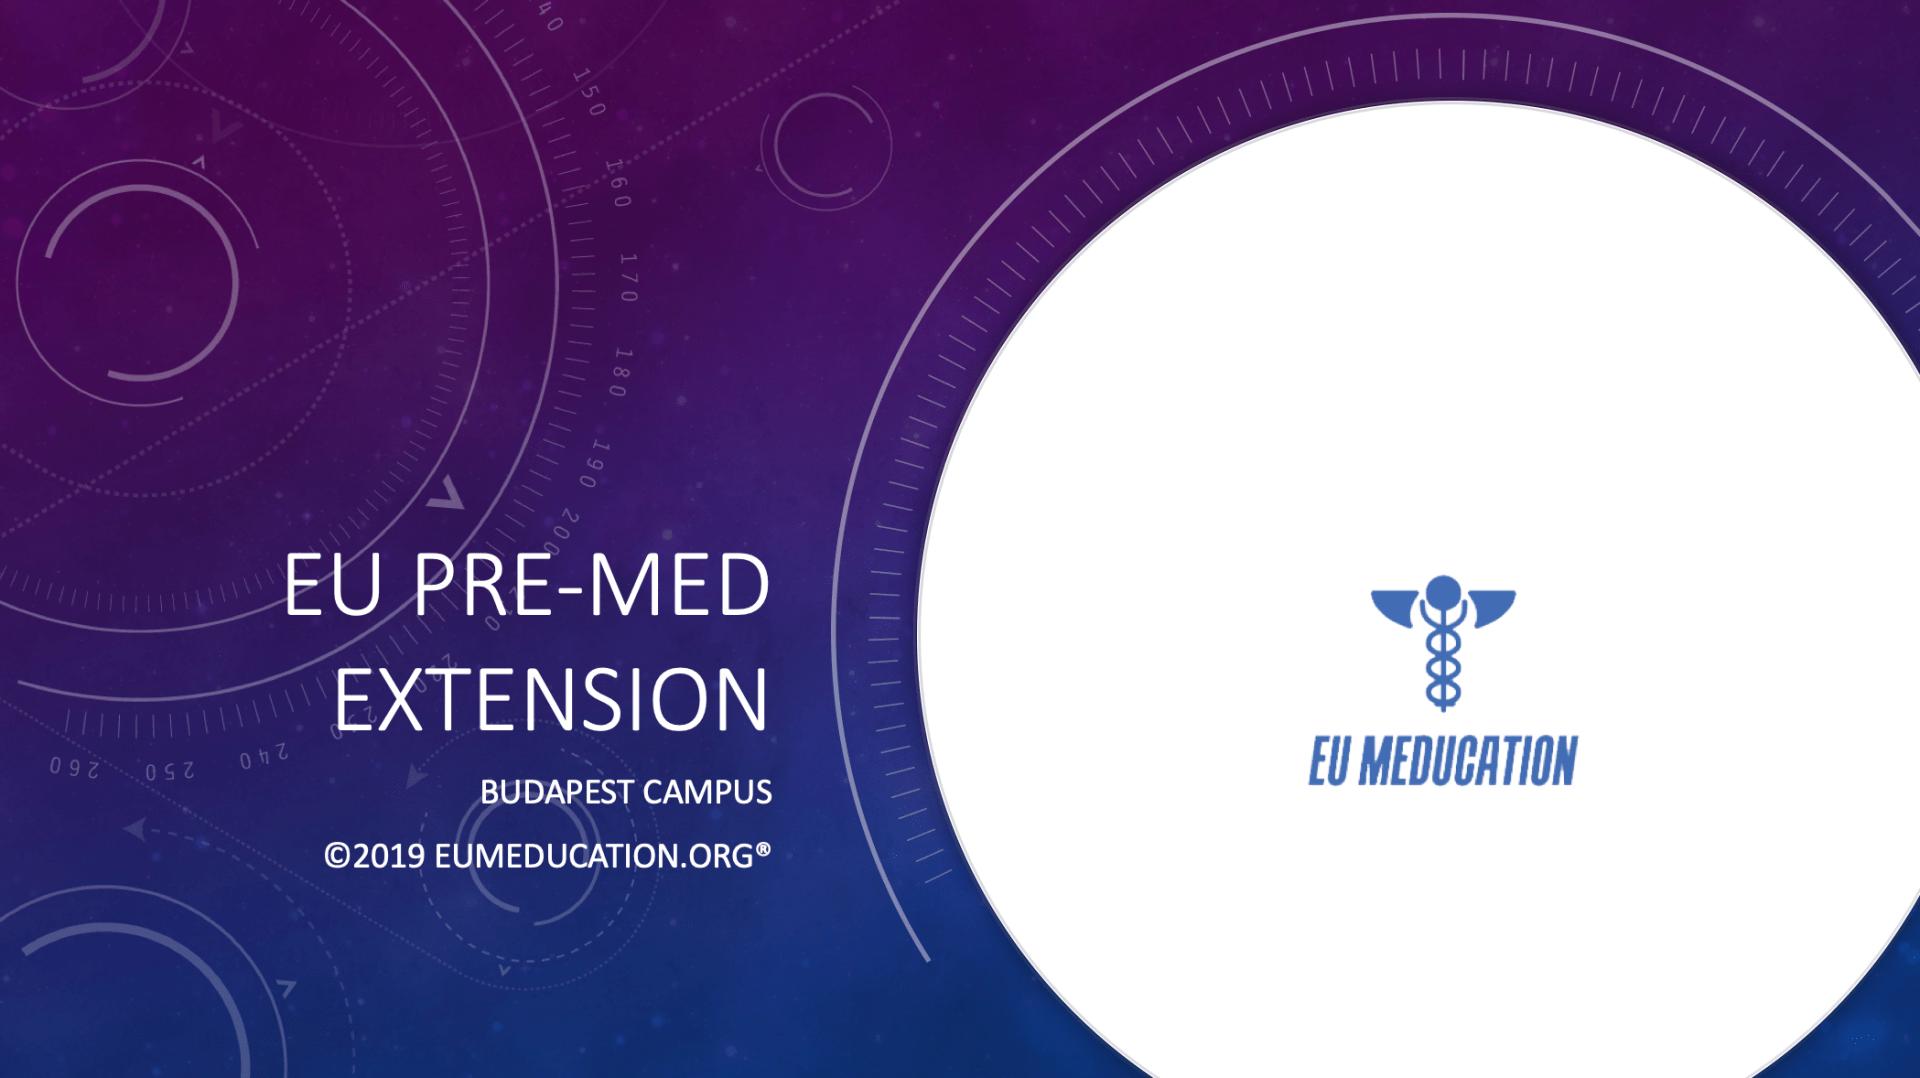 PREMED-EXTENSION-19ENG-01